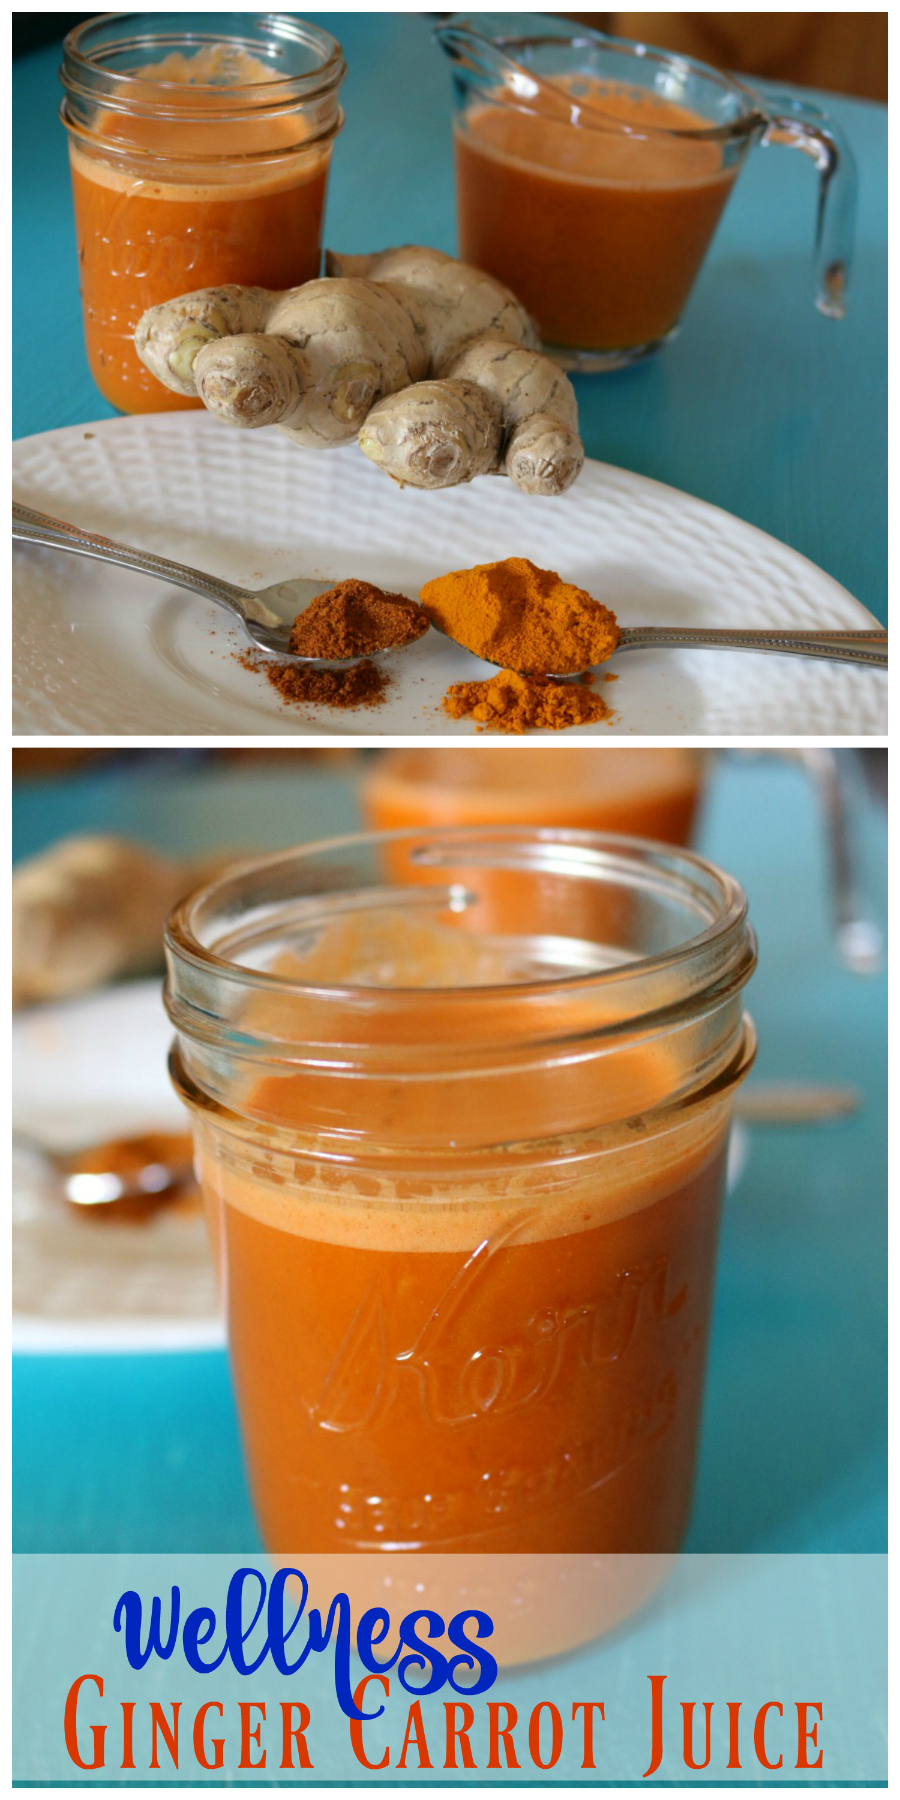 Wellness Ginger Carrot Juice - Anti-Inflammatory | CeceliasGoodStuff.com | Good Food for Good People